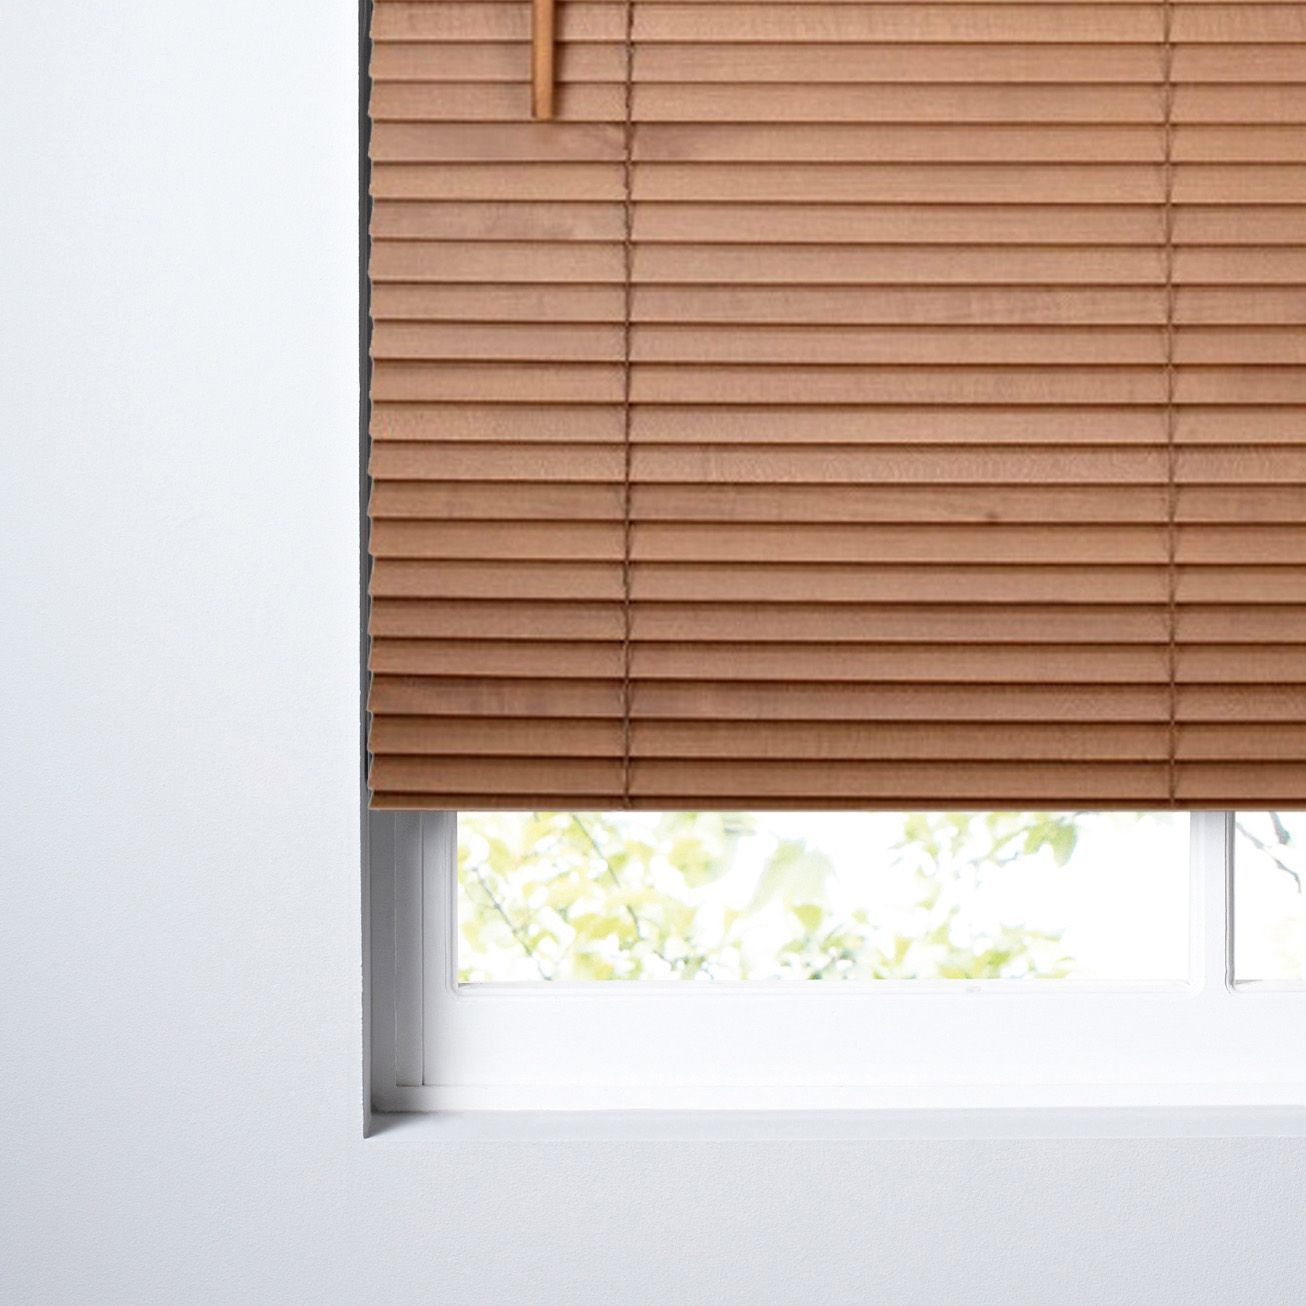 Bathroom Window Blinds B&Q colours marco mid brown venetian blind (w)180 cm (l)160 cm